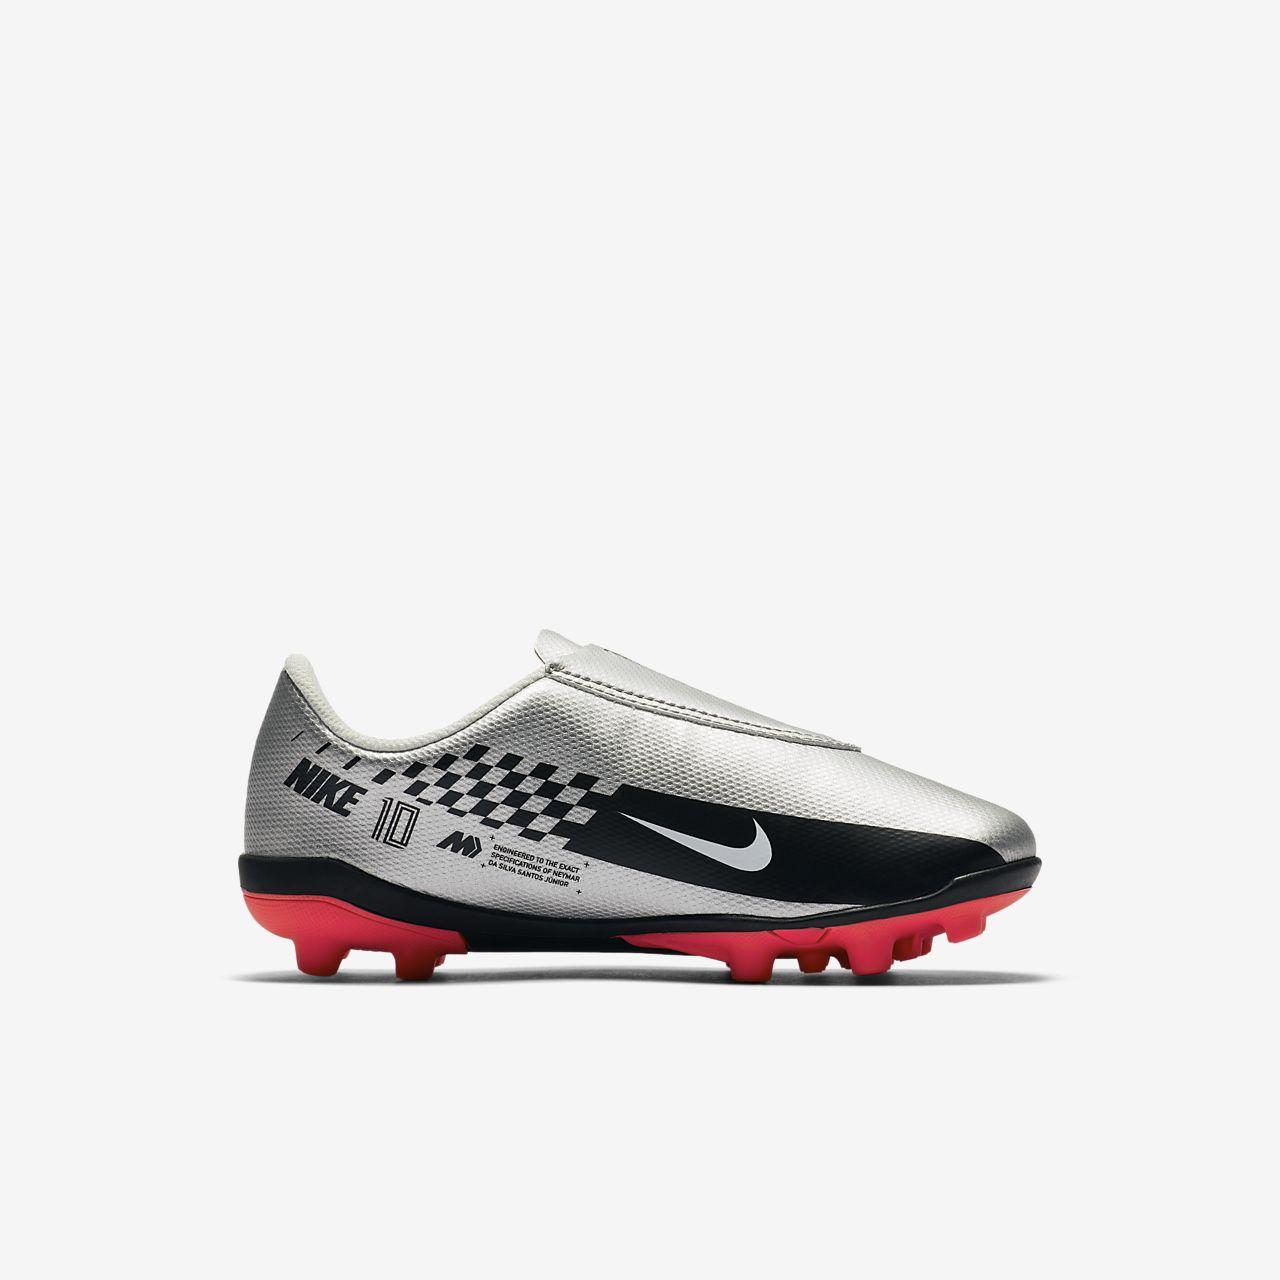 buying cheap cheap price shoes for cheap Nike Jr. Mercurial Vapor 13 Club Neymar Jr. MG Younger Kids' Multi-Ground  Football Boot